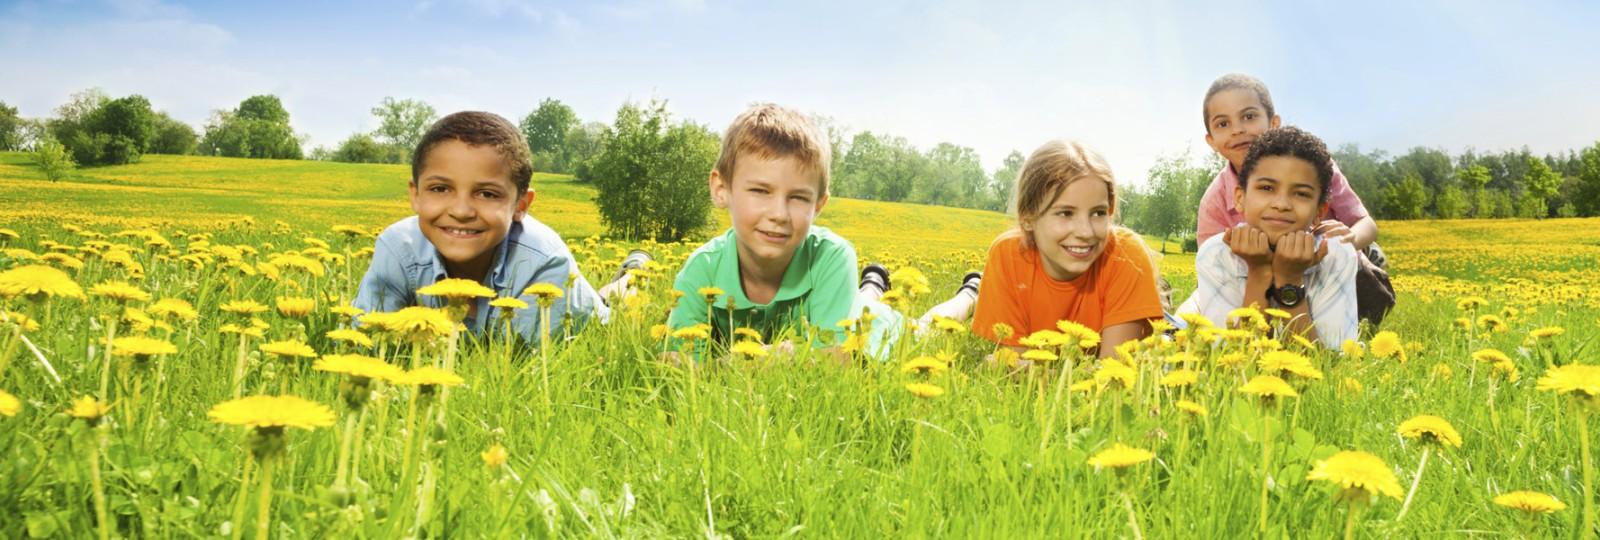 children s health community health network